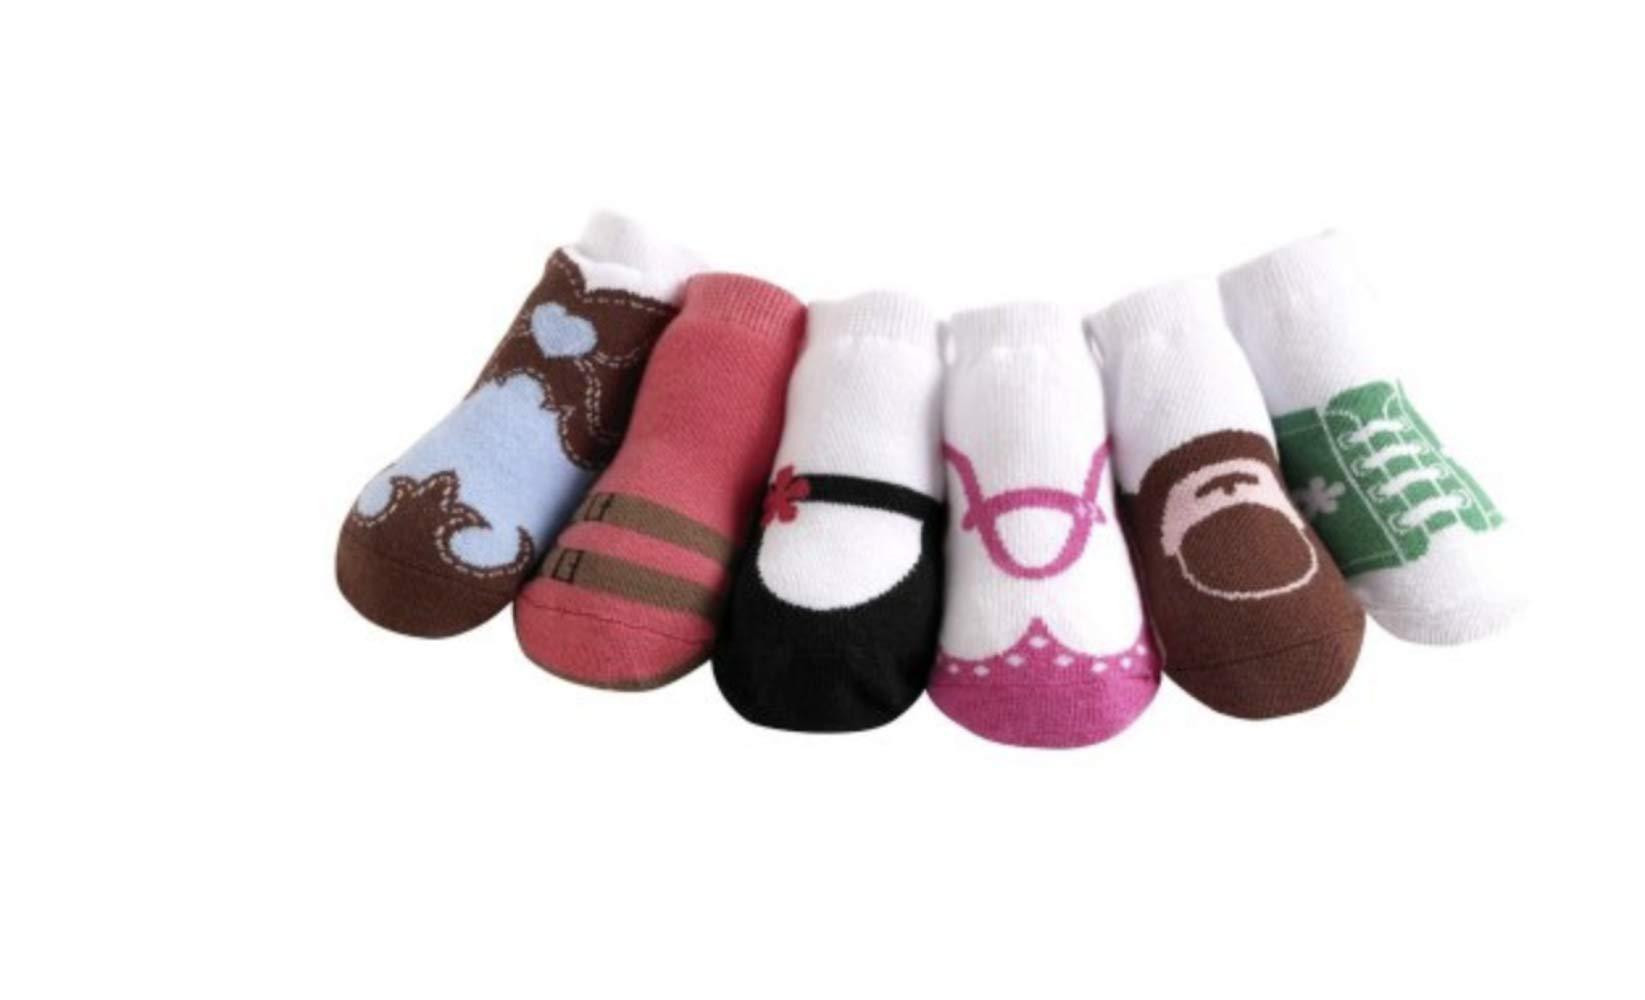 JazzyToes Baby 6 Pair Socks Original Variety - Girls, 0-12 Months by Jazzy Toes